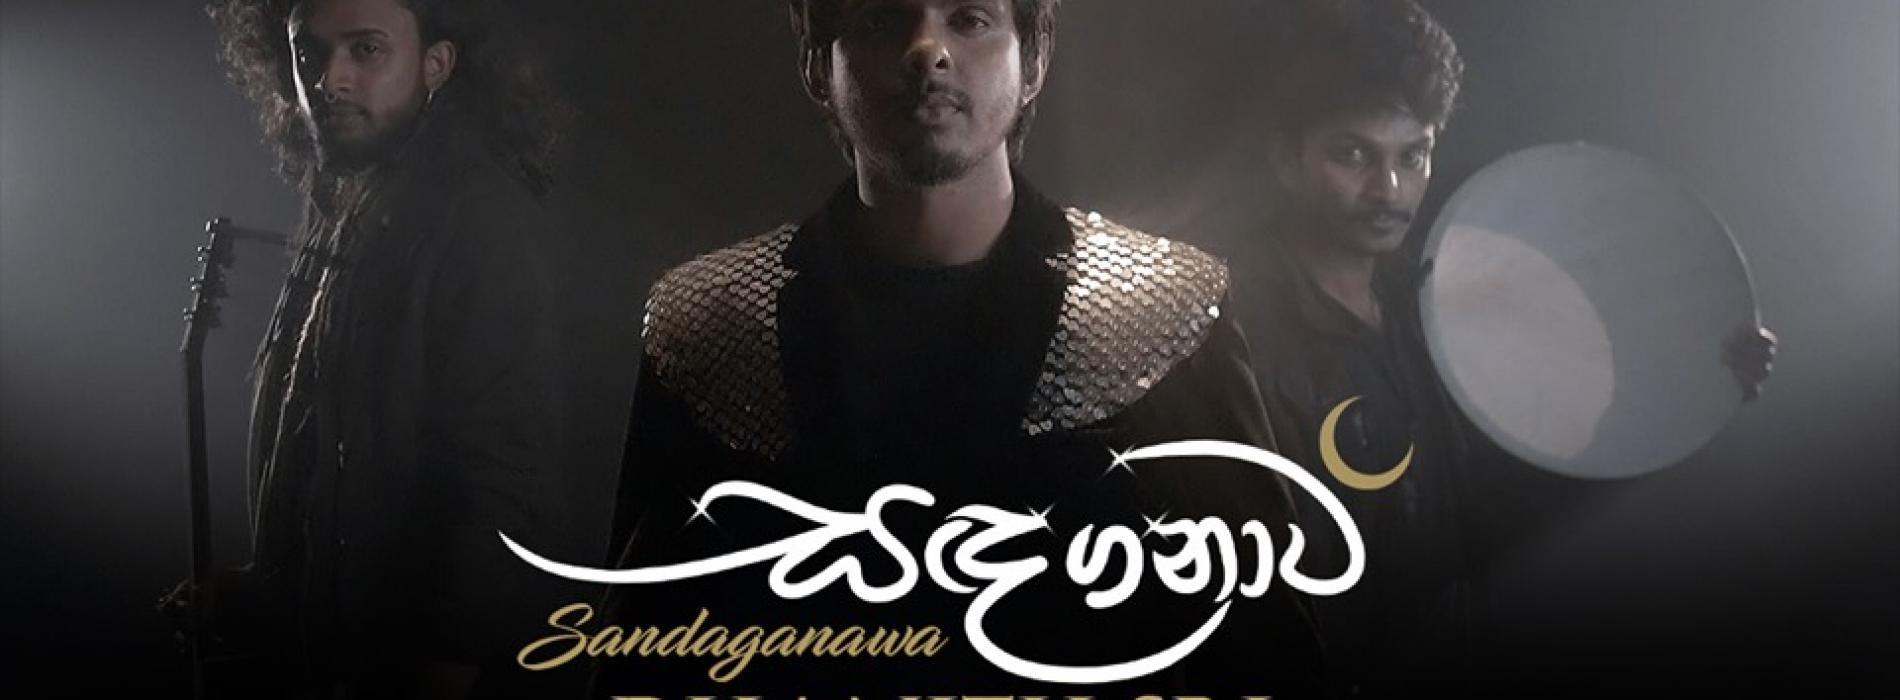 DHANITH SRI – Sandaganawa (සඳගනාව) Official Music Video